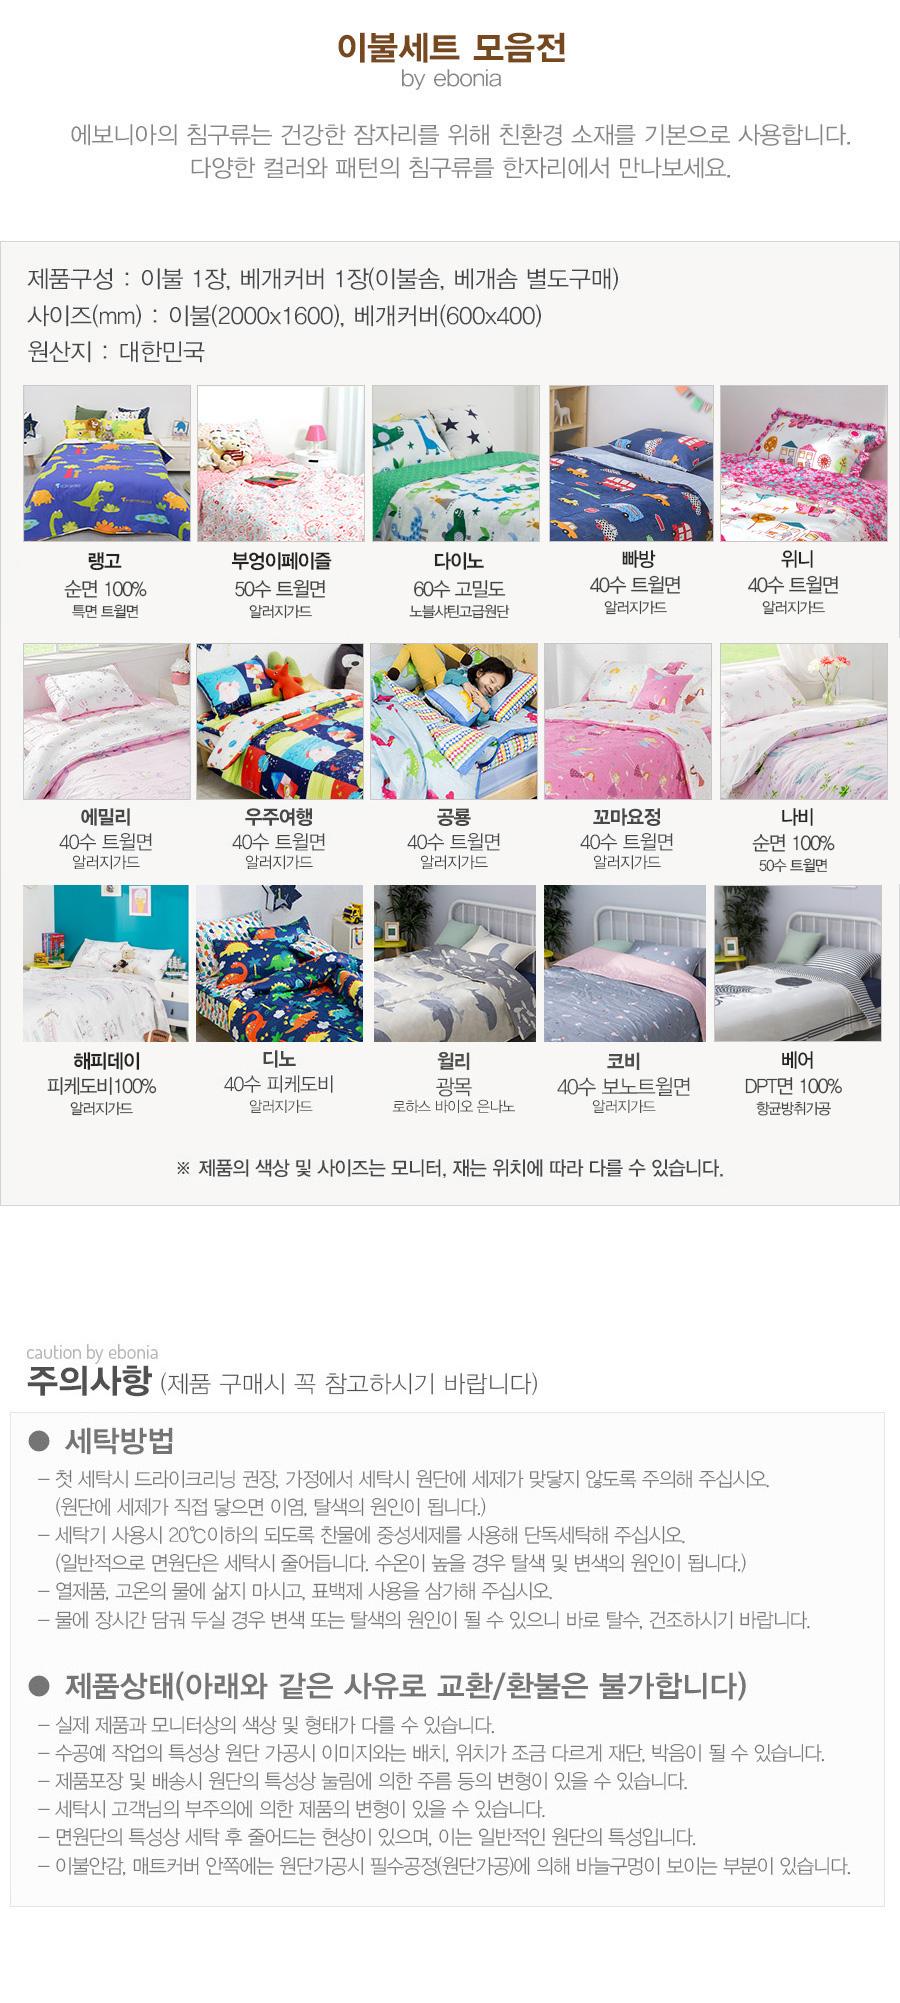 title_comforter.jpg